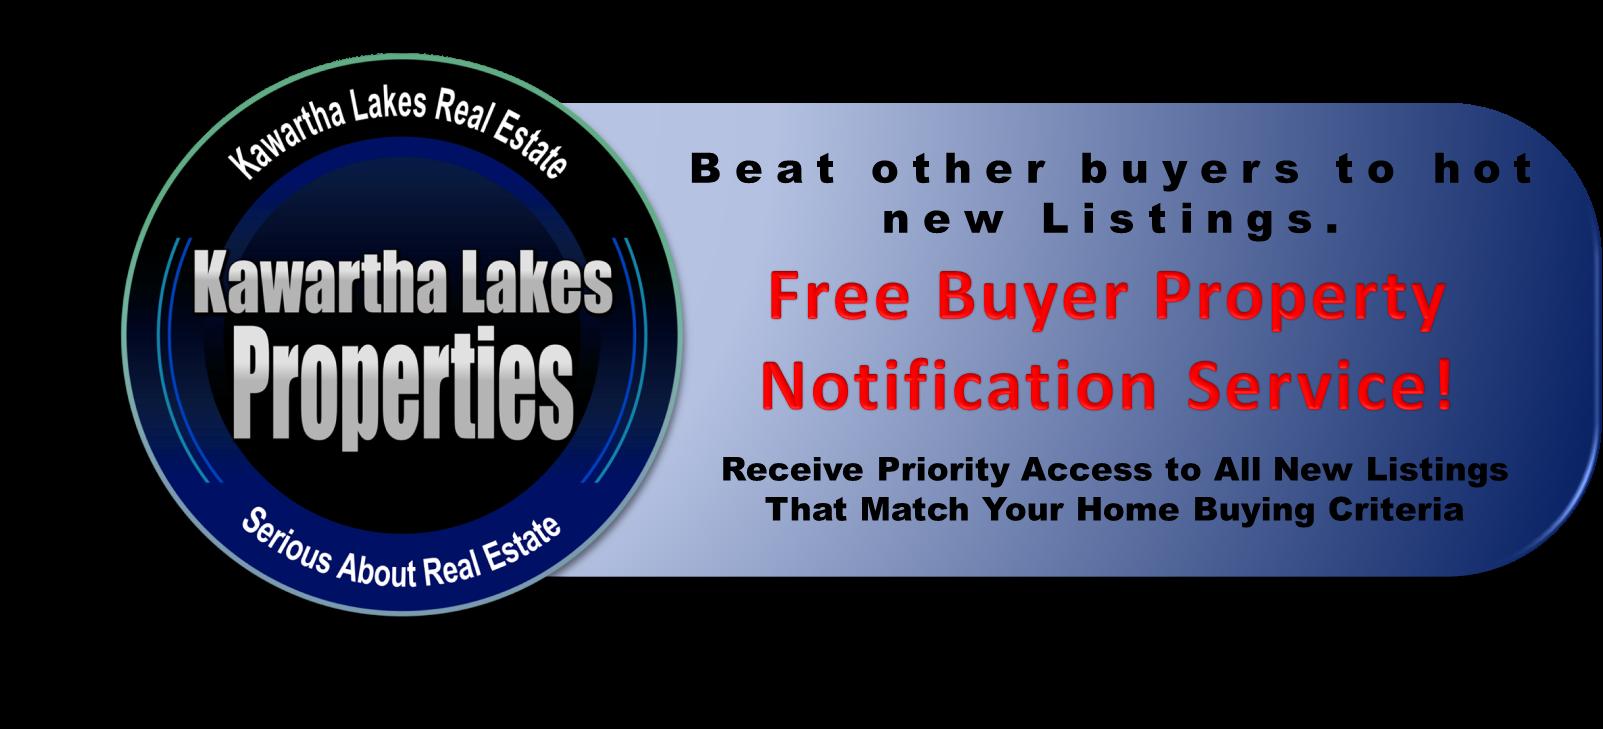 Kawartha Lakes Custom Buyers VIP Property Notification Service